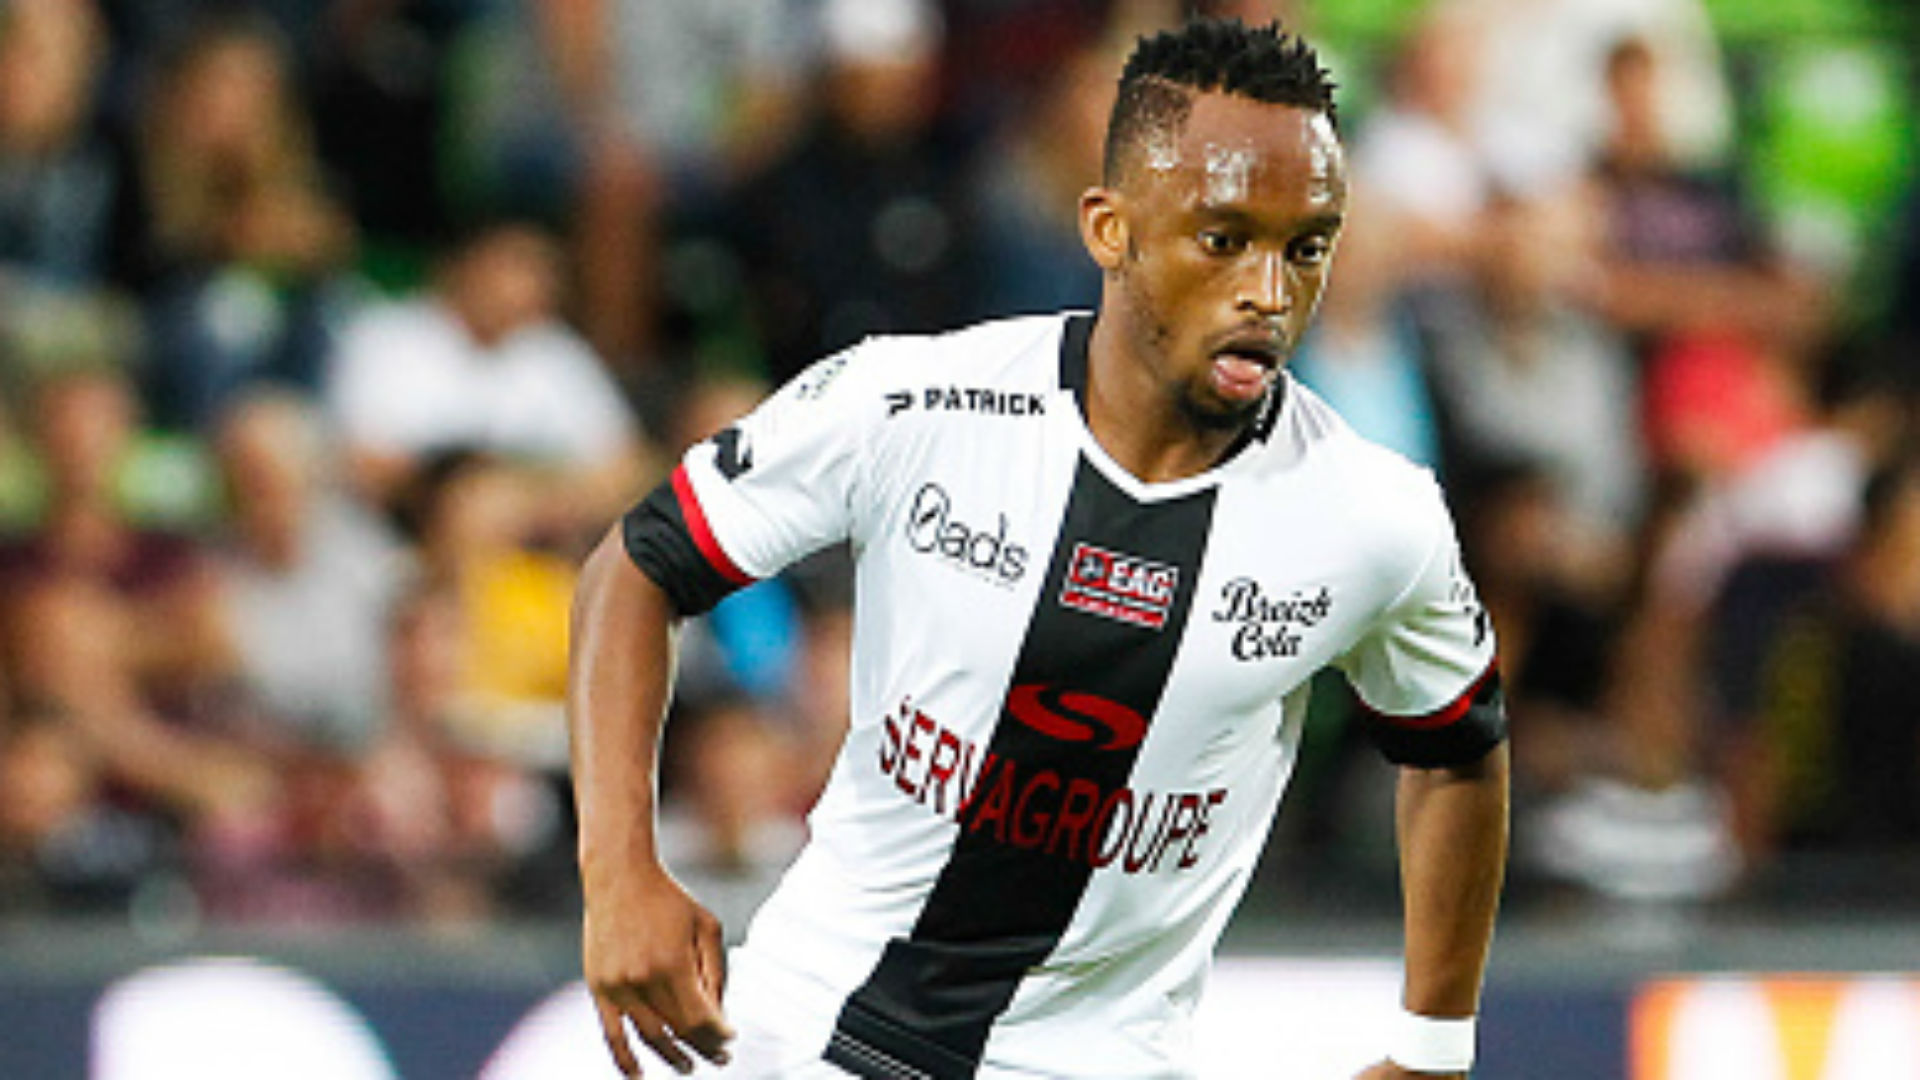 Guingamp & Bafana Bafana's Phiri sheds light on life under lockdown and wage cut possibilities